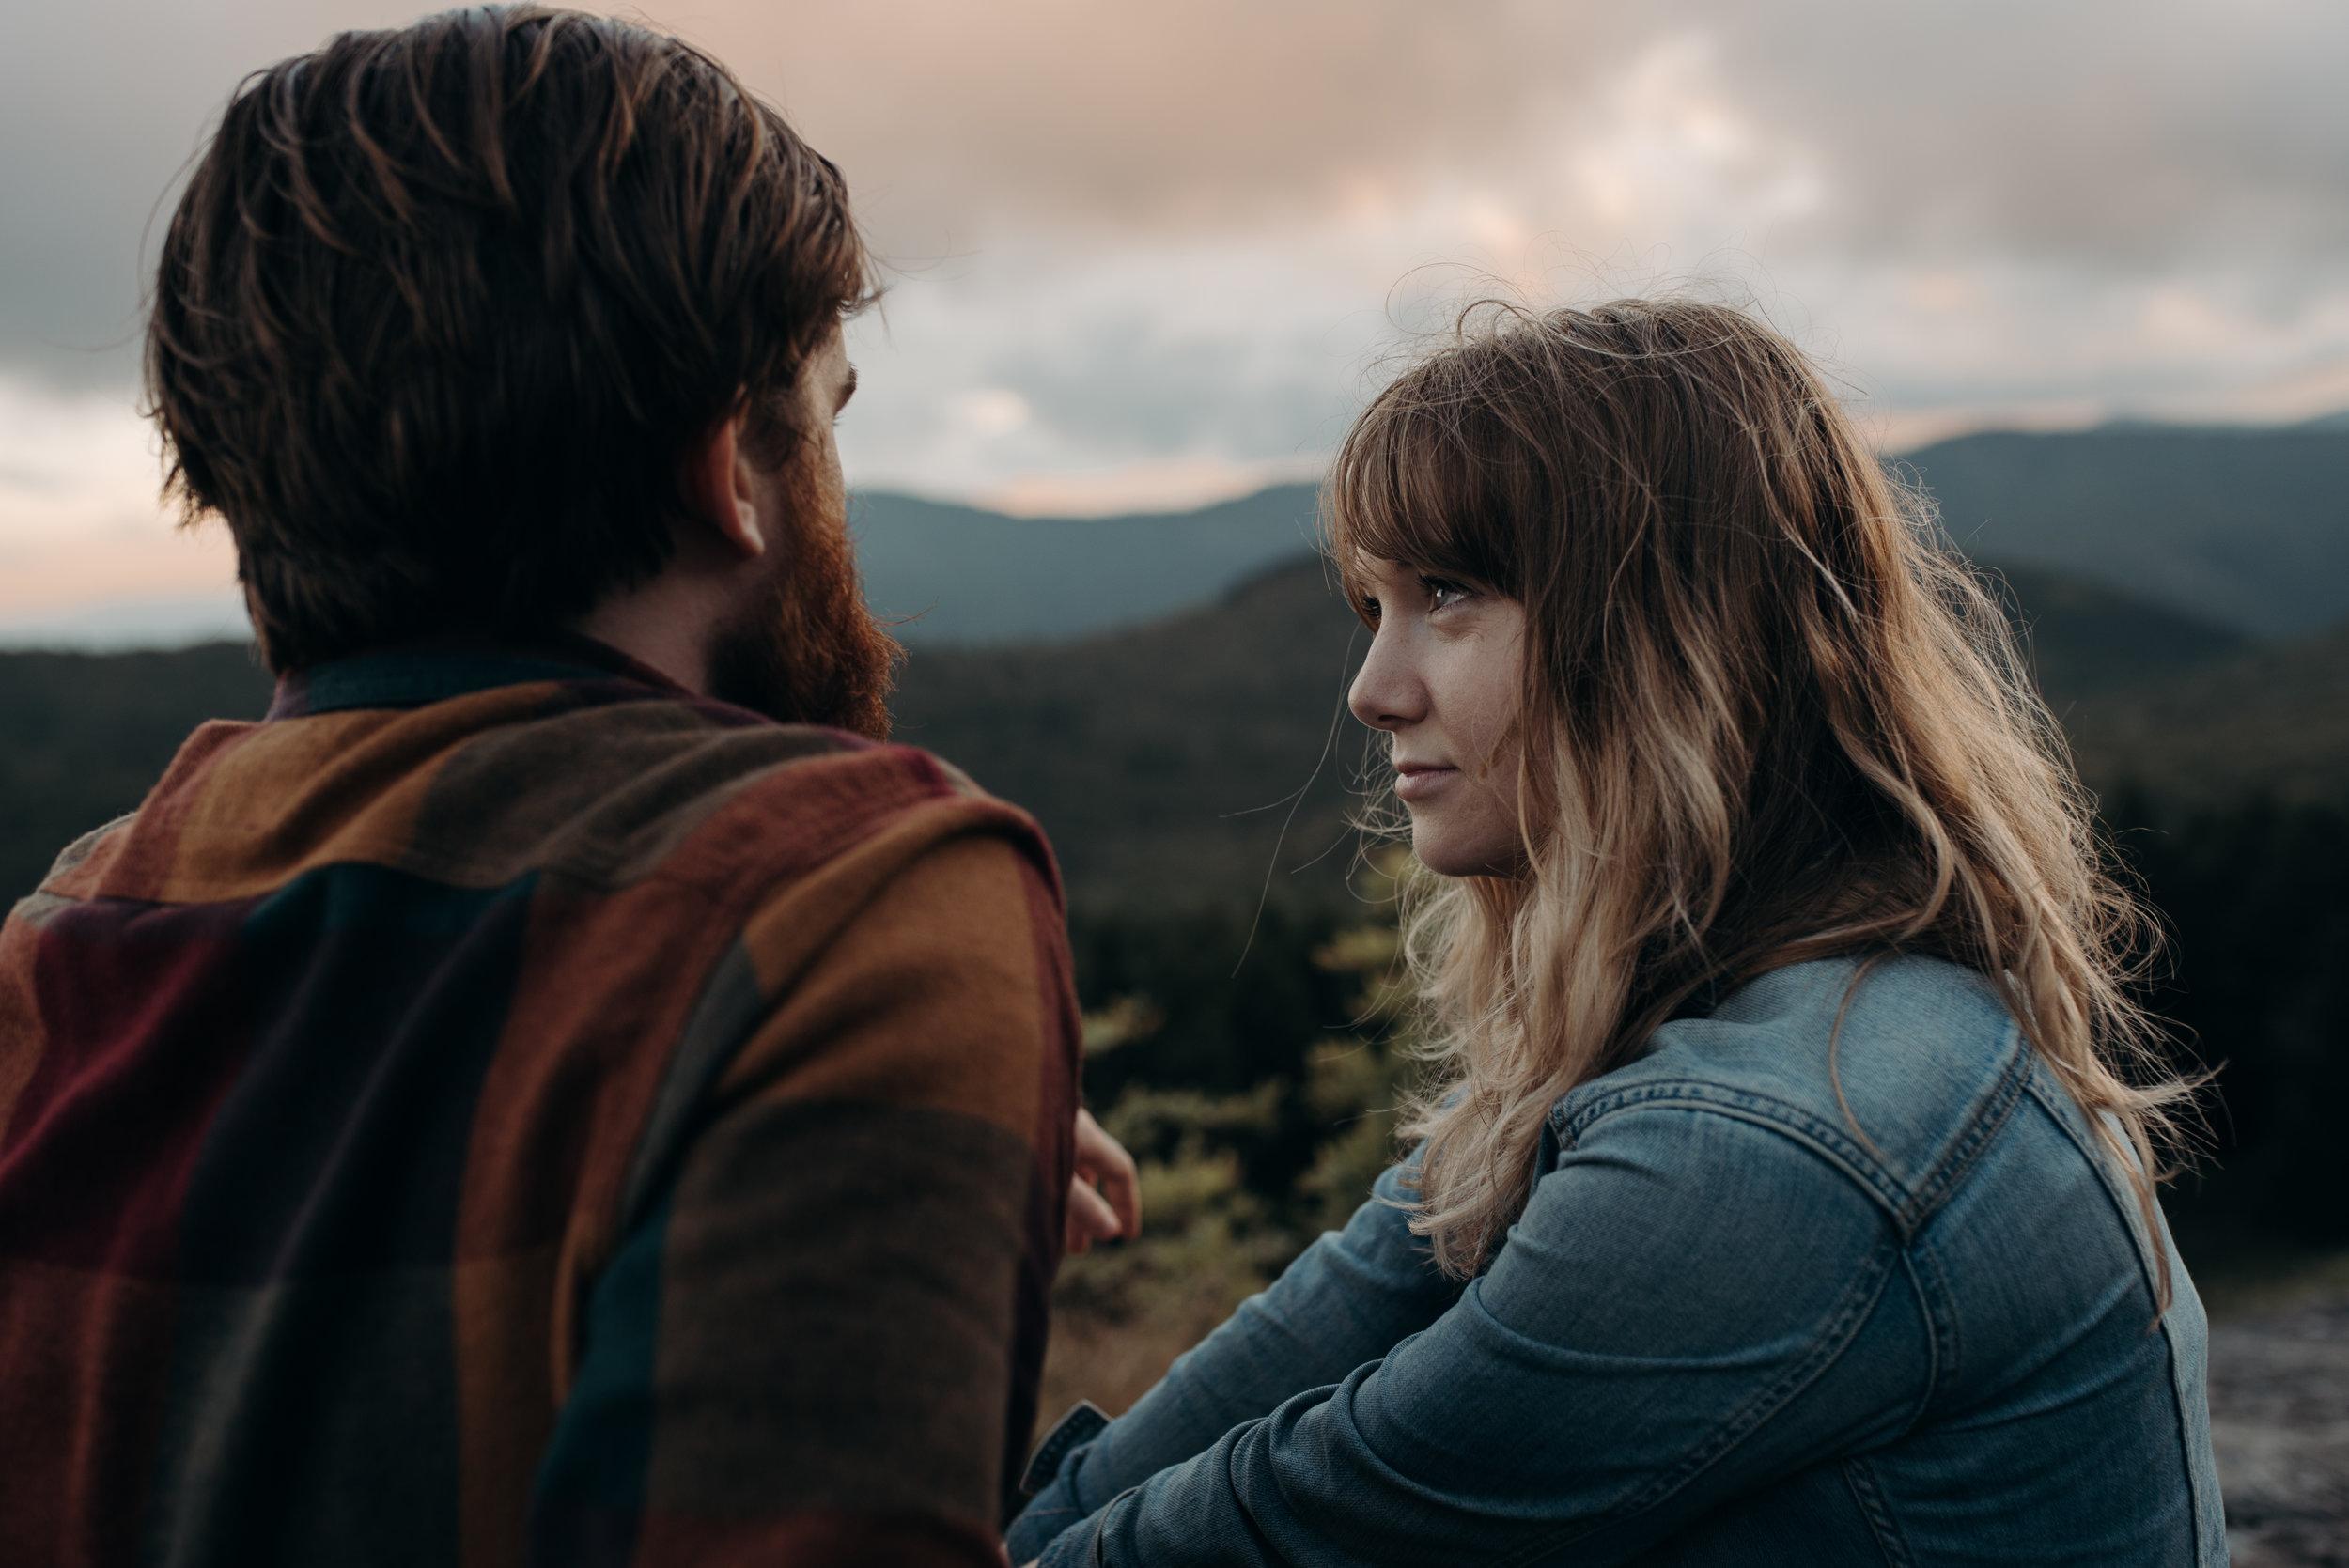 leah-joe-middleton-asheville-north-carolina-couple-session-destination-elopement-photographer-fox-and-film-158.jpg